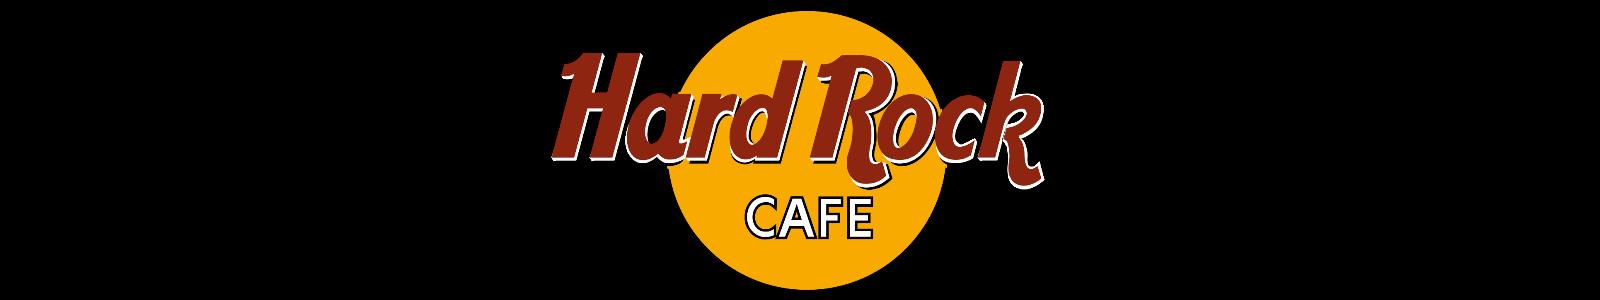 Hard Rock Cafe – Seattle - Business Sponsor of The DJ Sessions